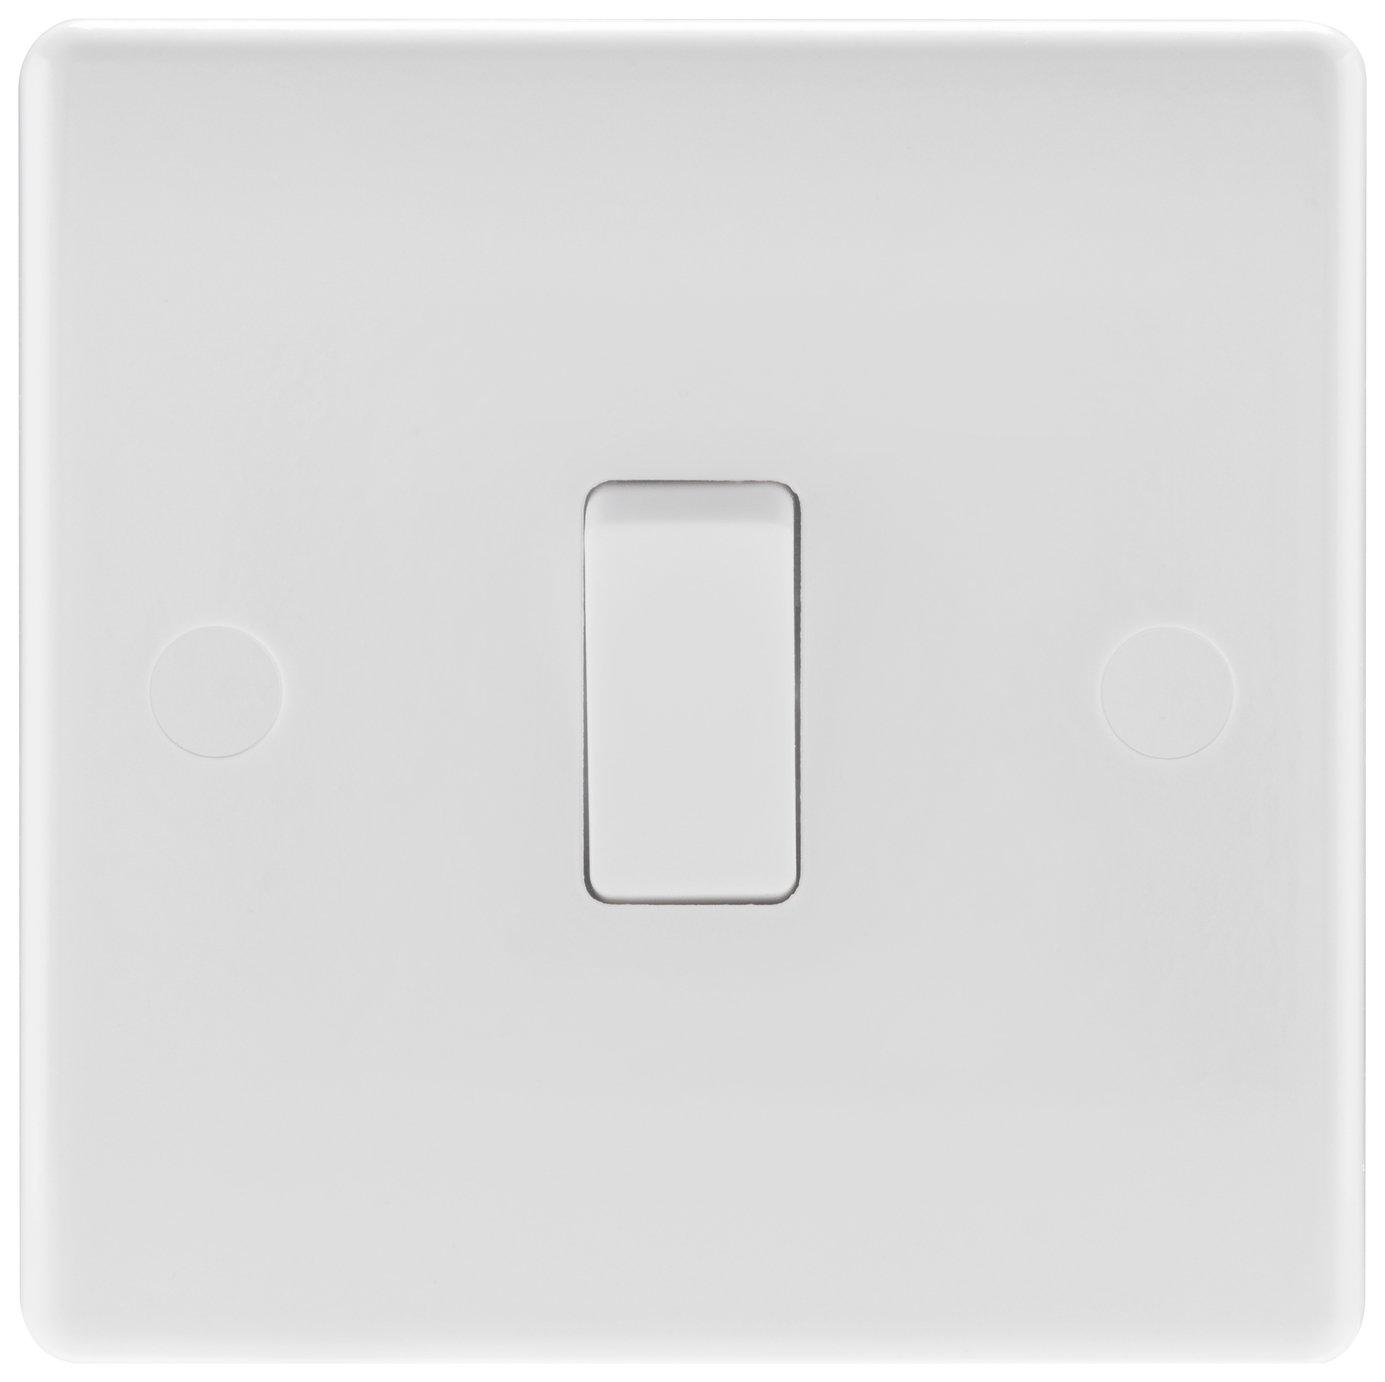 BG Single 2 Way Light Switch - White